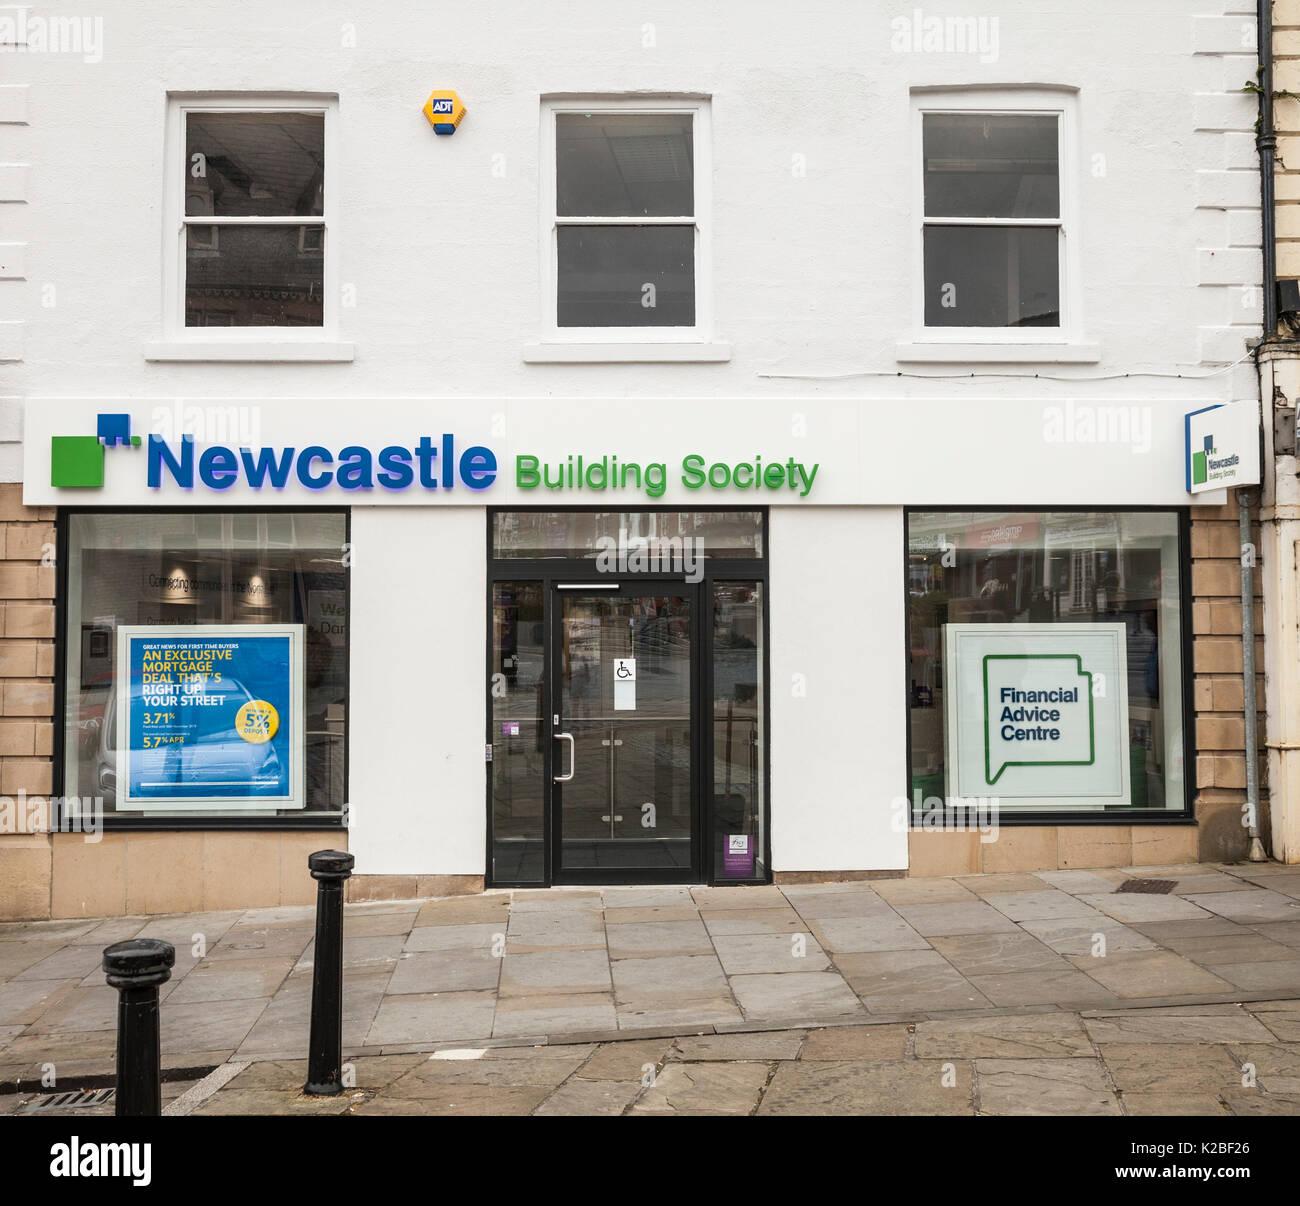 Newcastle Building Society in Darlington,England,UK - Stock Image